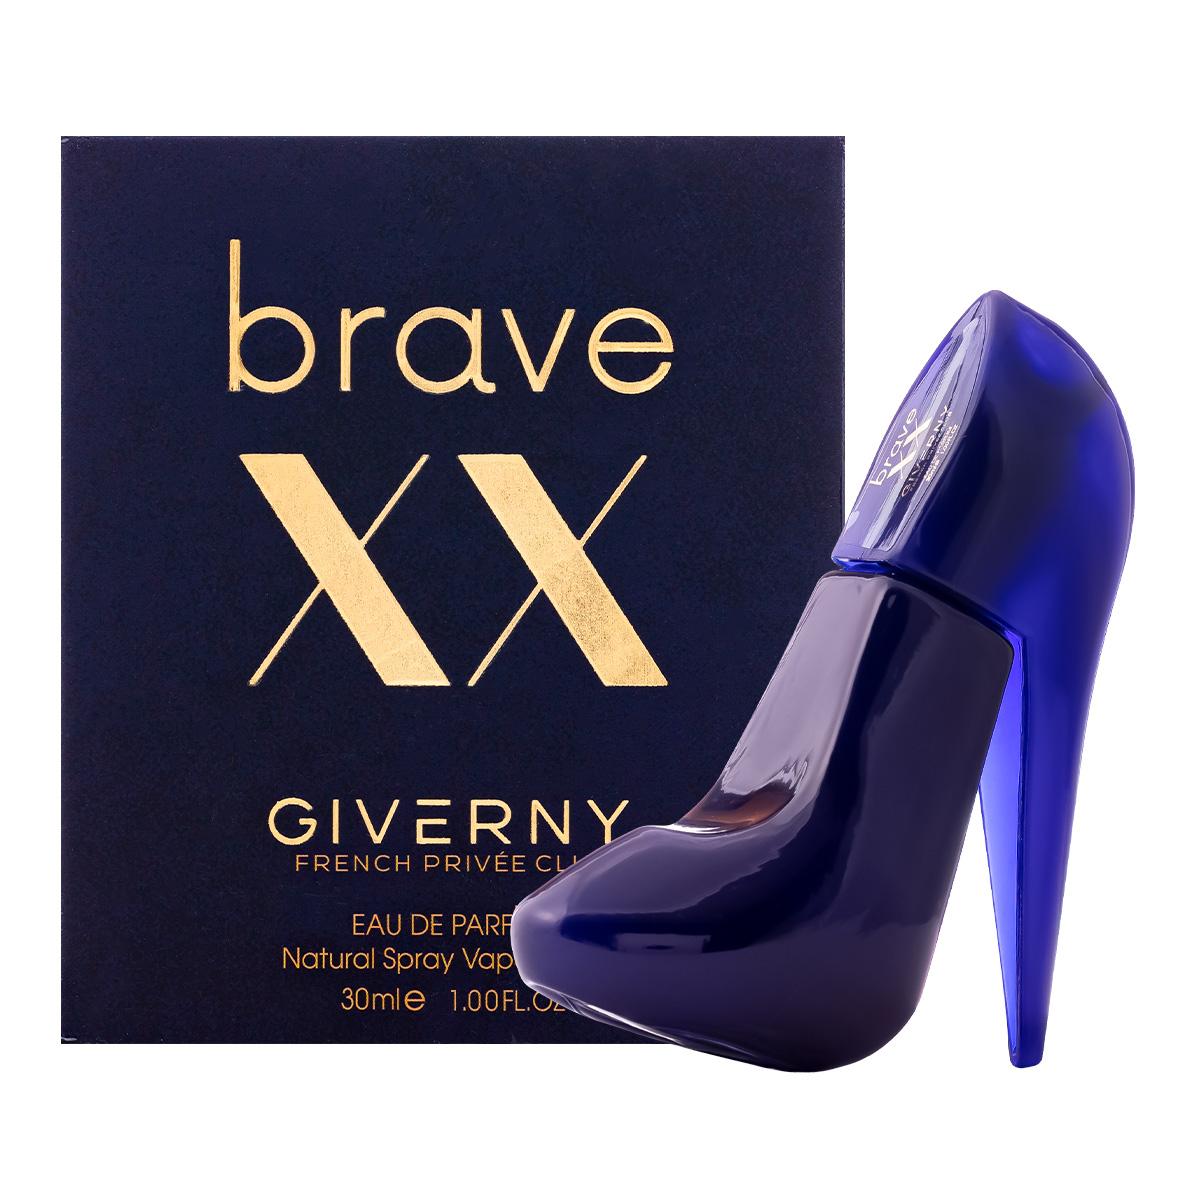 Perfume Brave XX Sapatinho Feminino EDP 30ml Giverny  - Mercari Perfumes